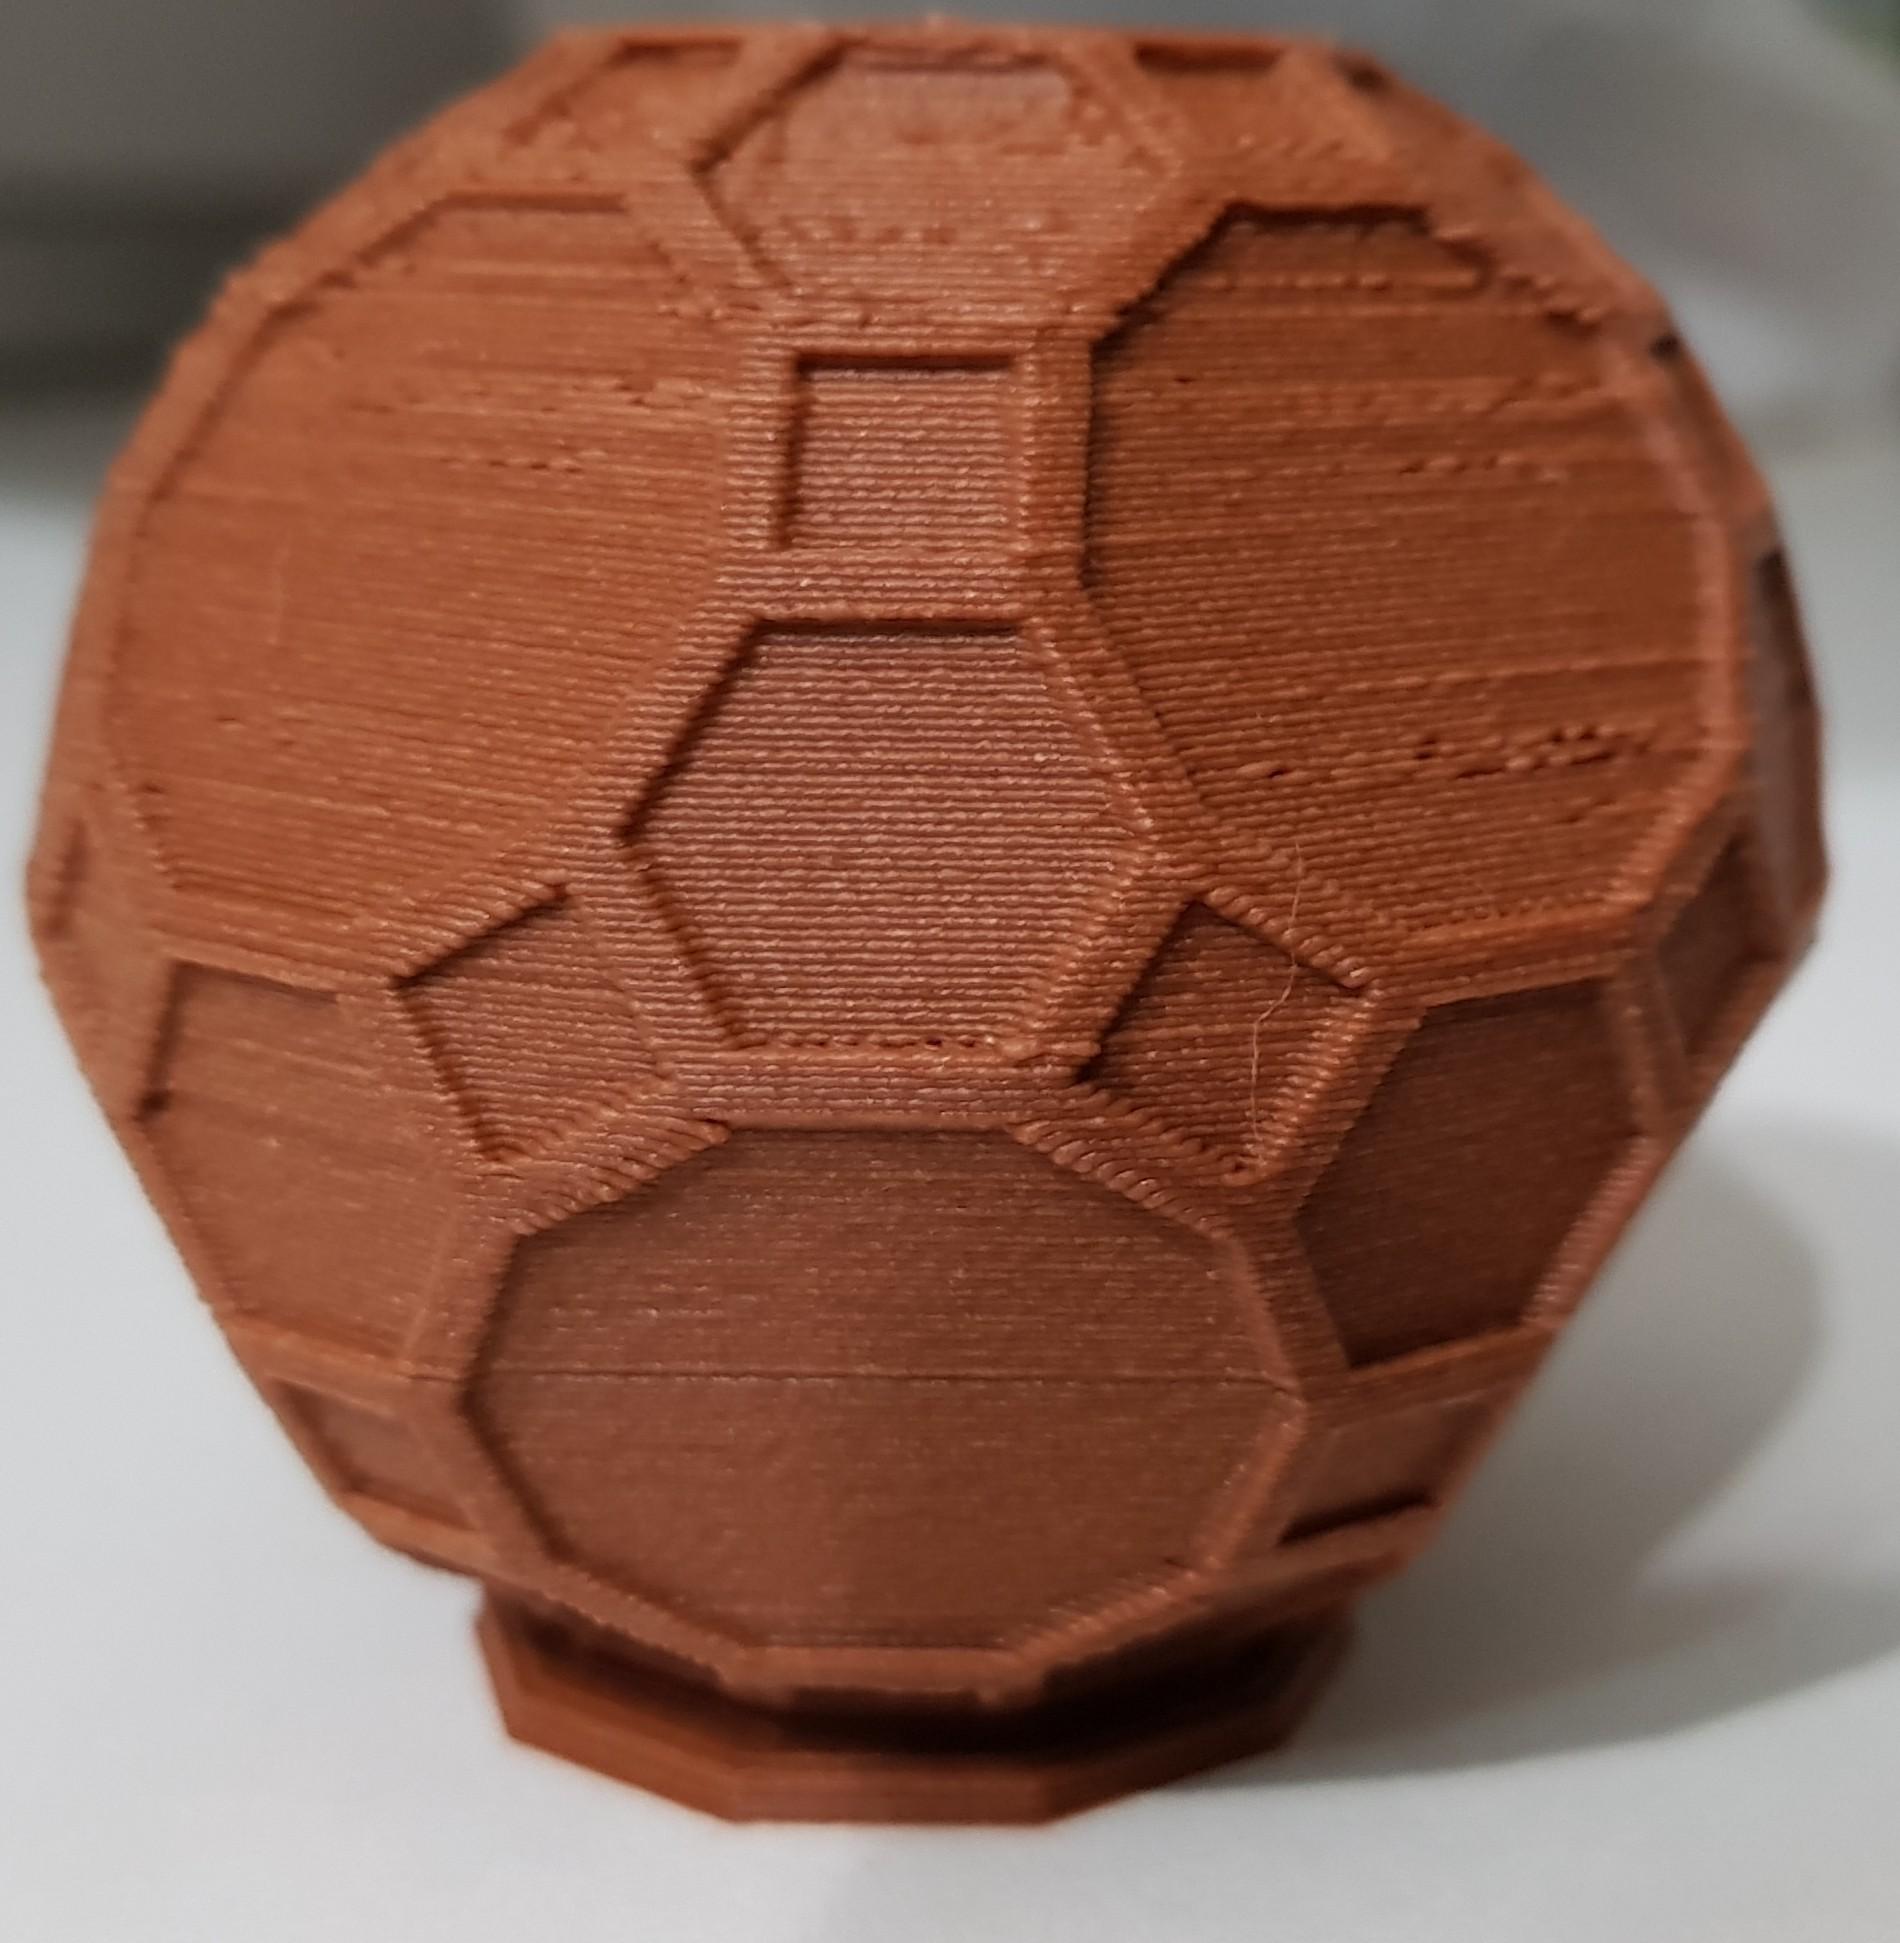 20180311_233745.jpg Download free STL file Geometric mini planter • 3D printable object, solunkejagruti